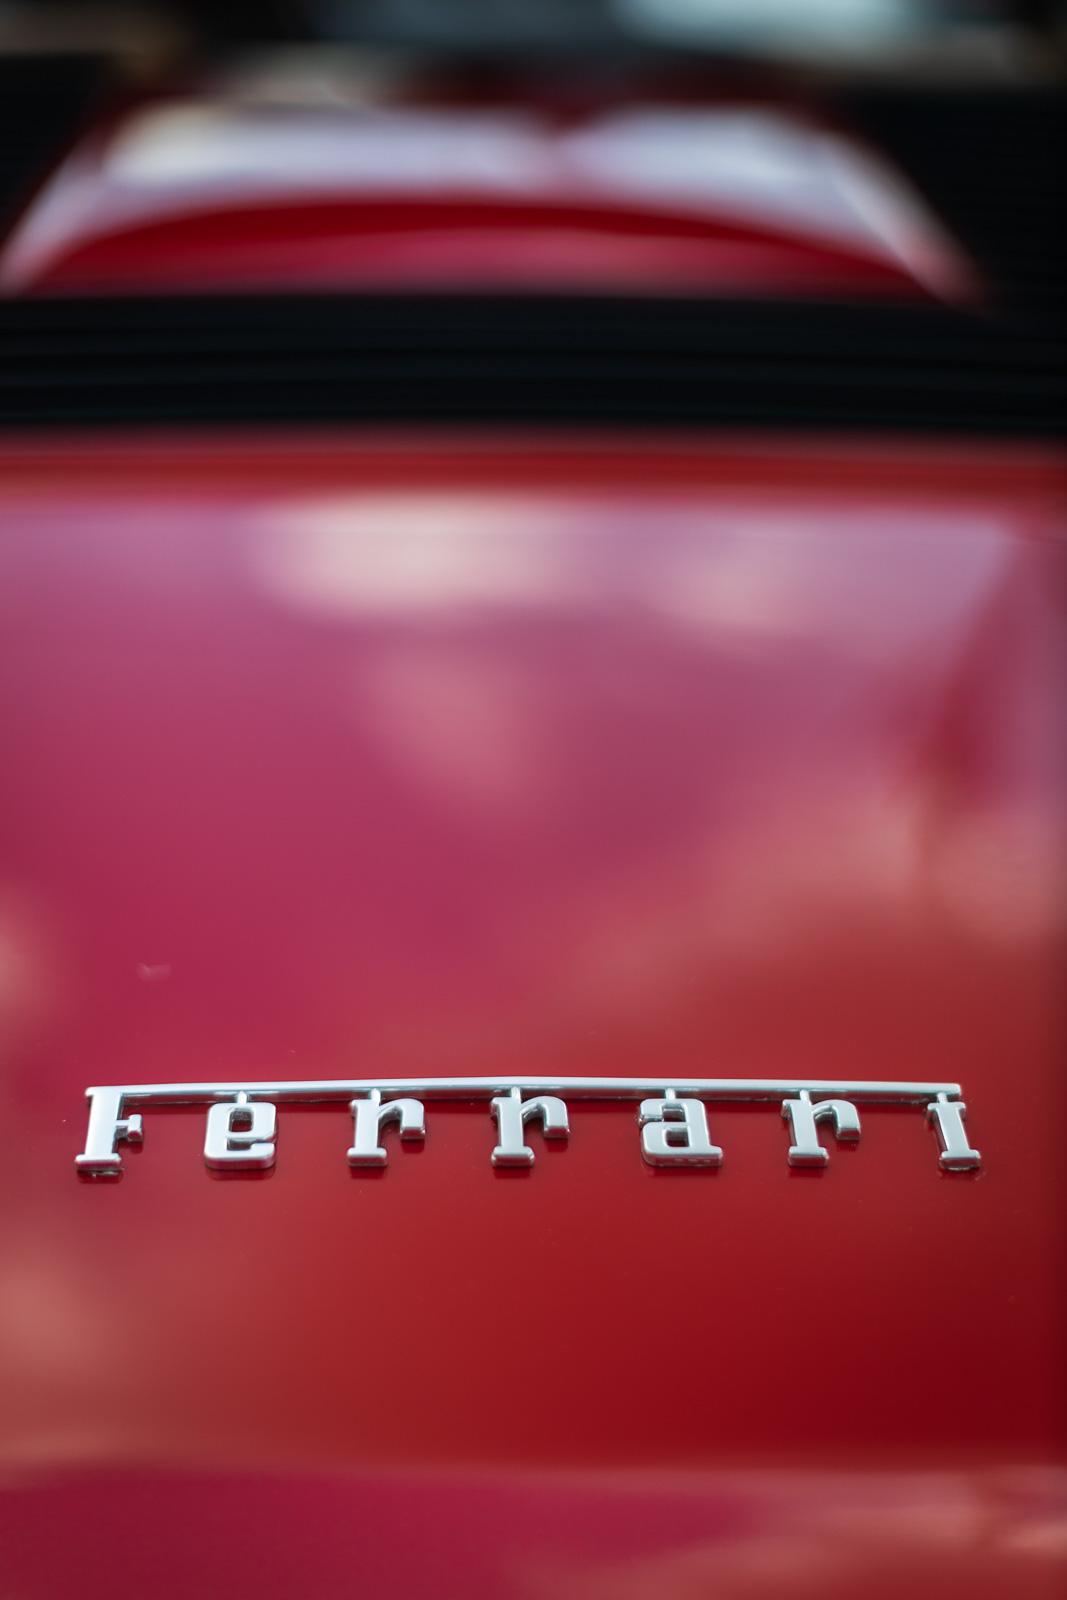 fat-guys-car-show-blog-34.jpg